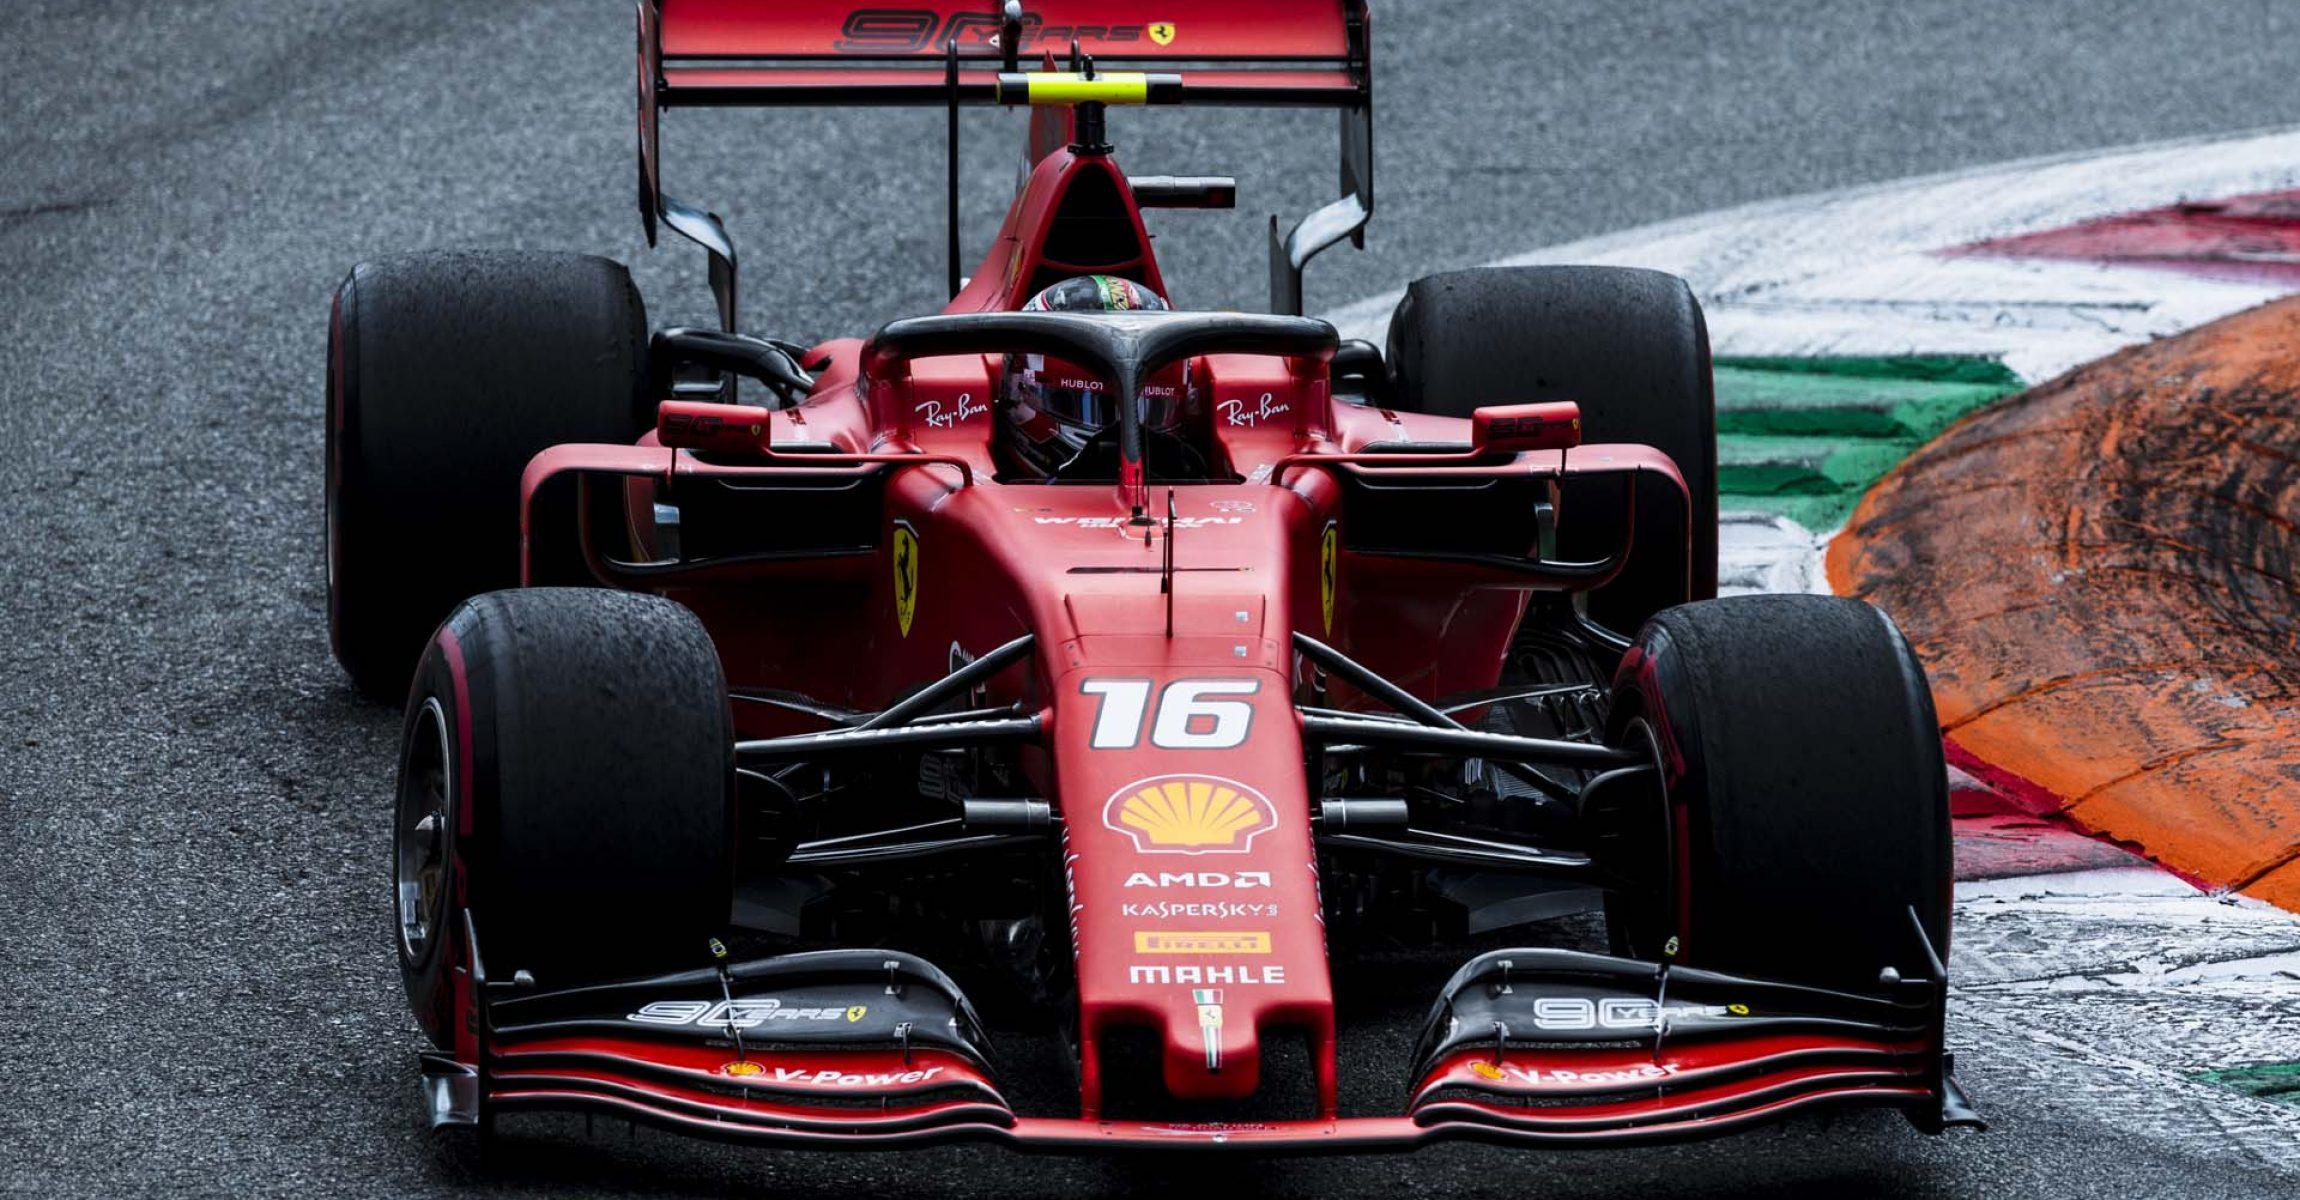 Charles Leclerc, Ferrari, Monza